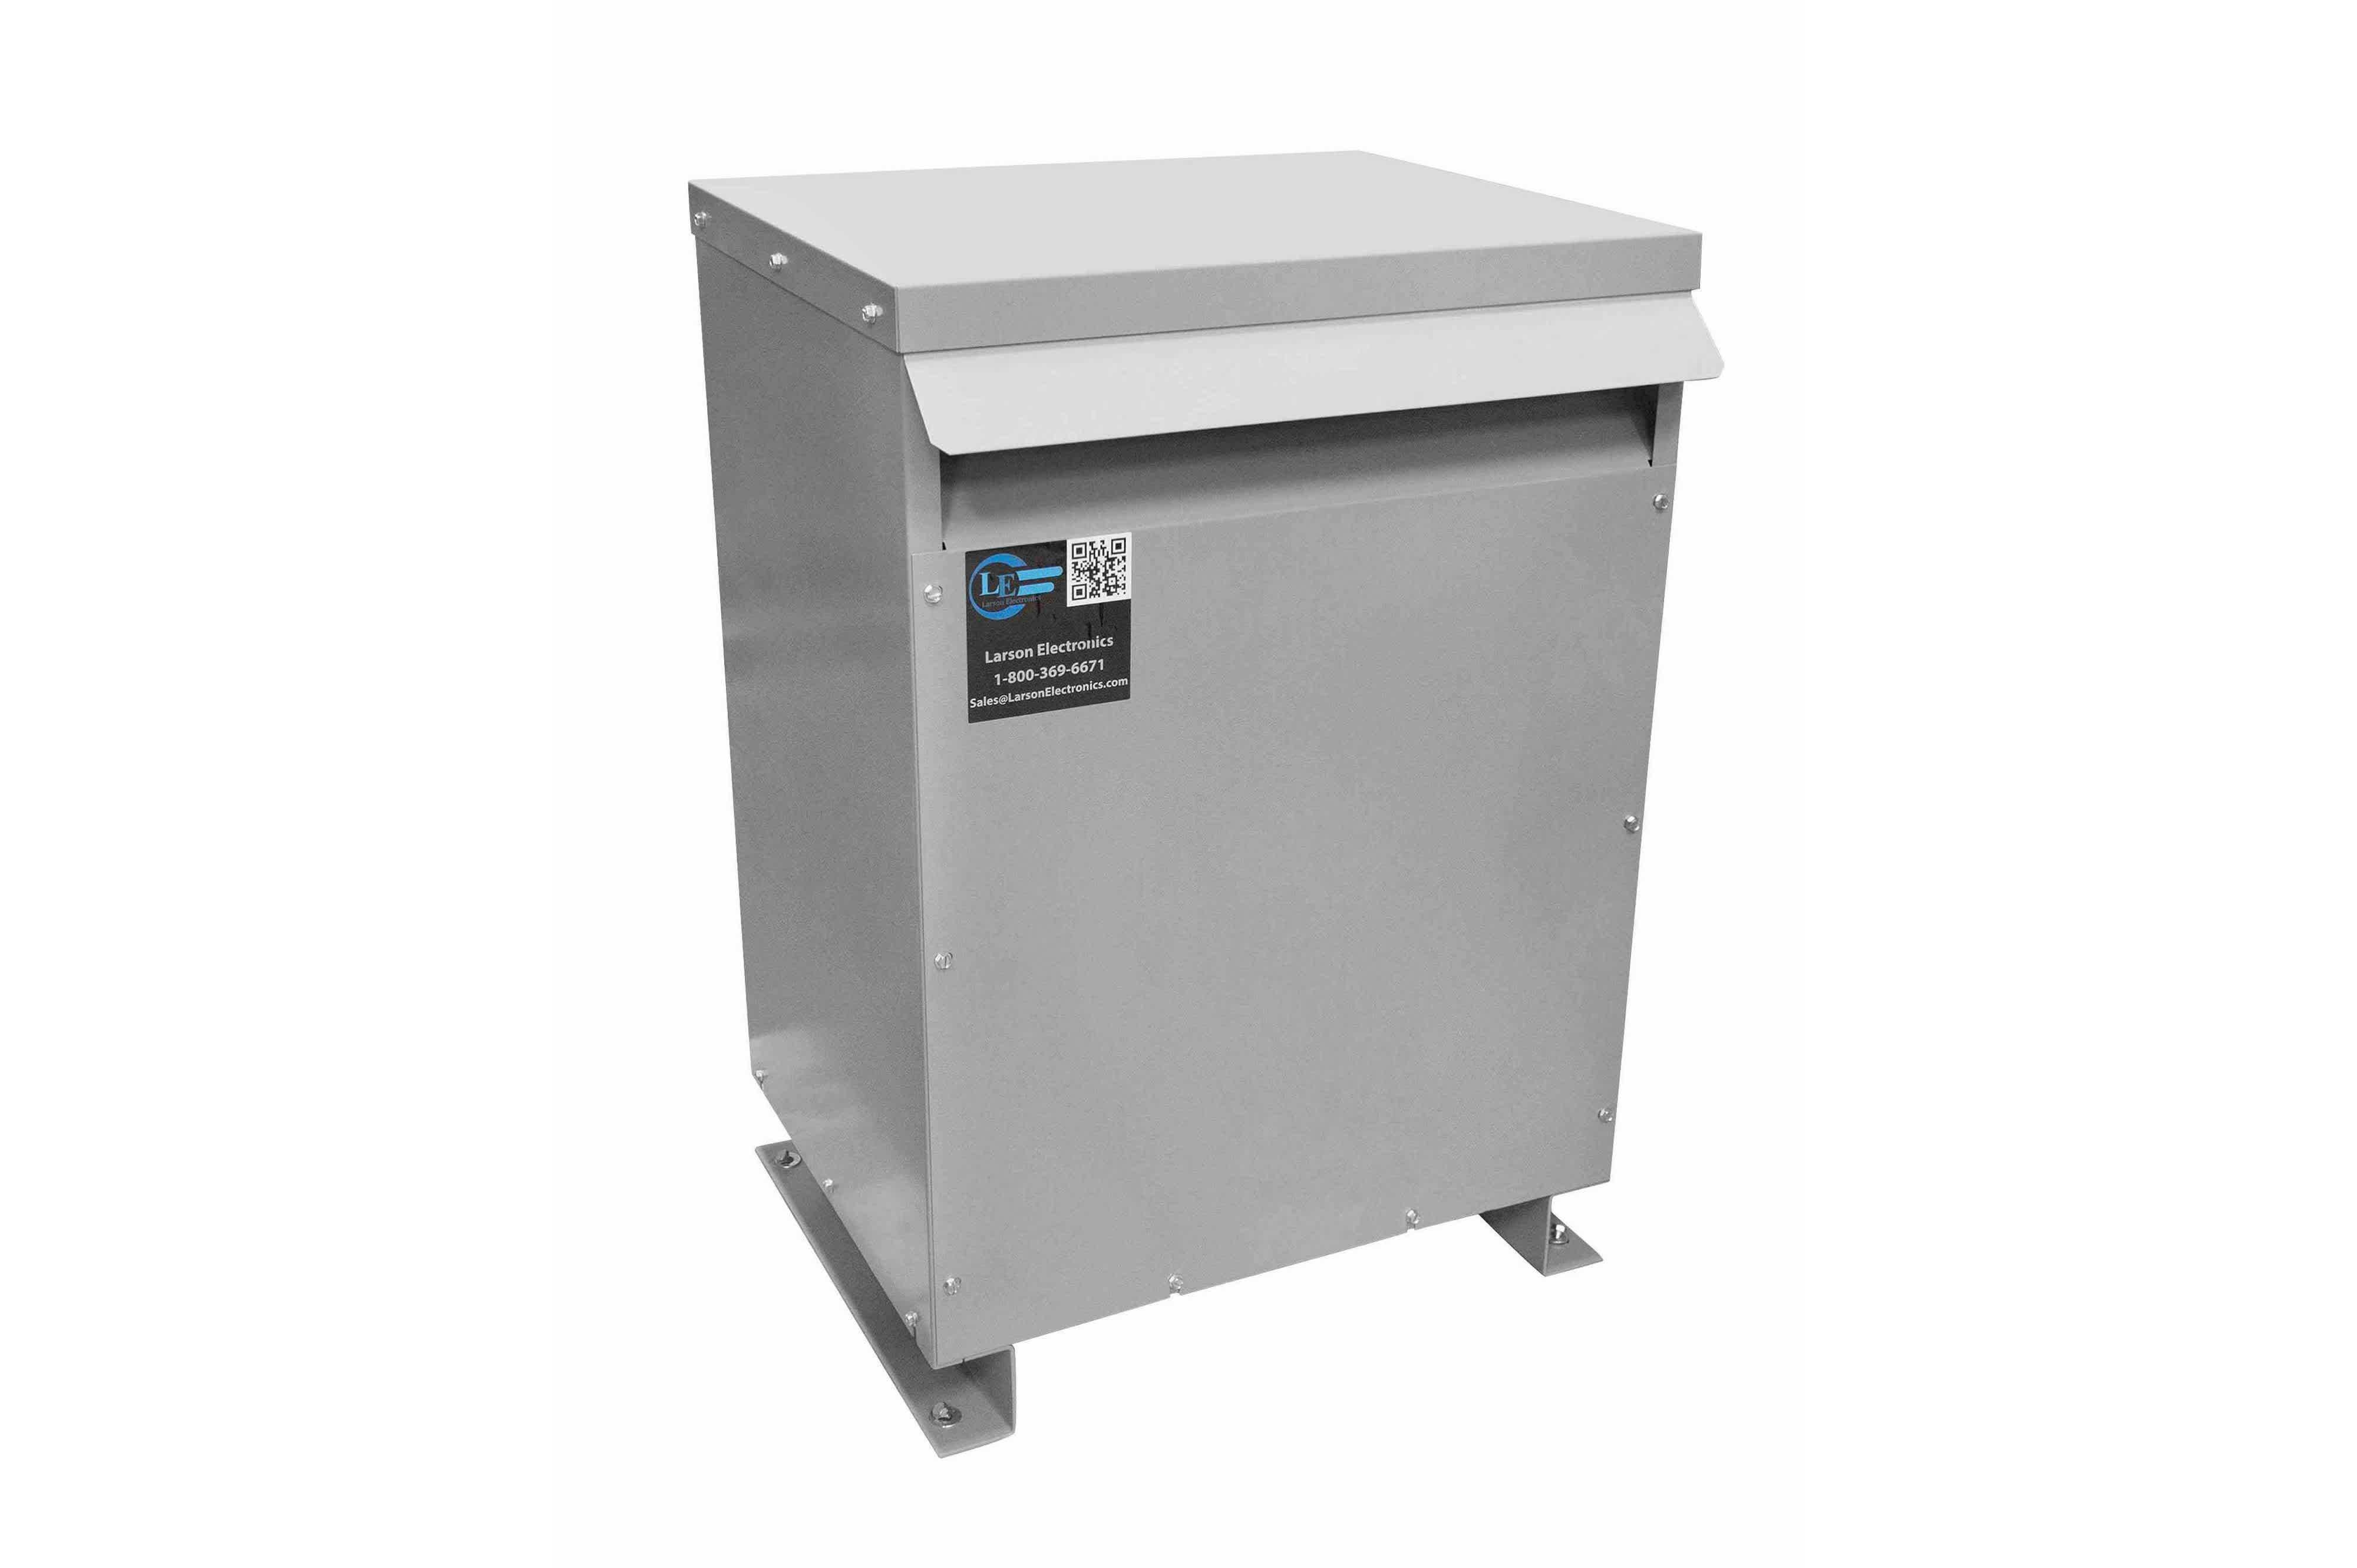 200 kVA 3PH Isolation Transformer, 460V Wye Primary, 400V Delta Secondary, N3R, Ventilated, 60 Hz